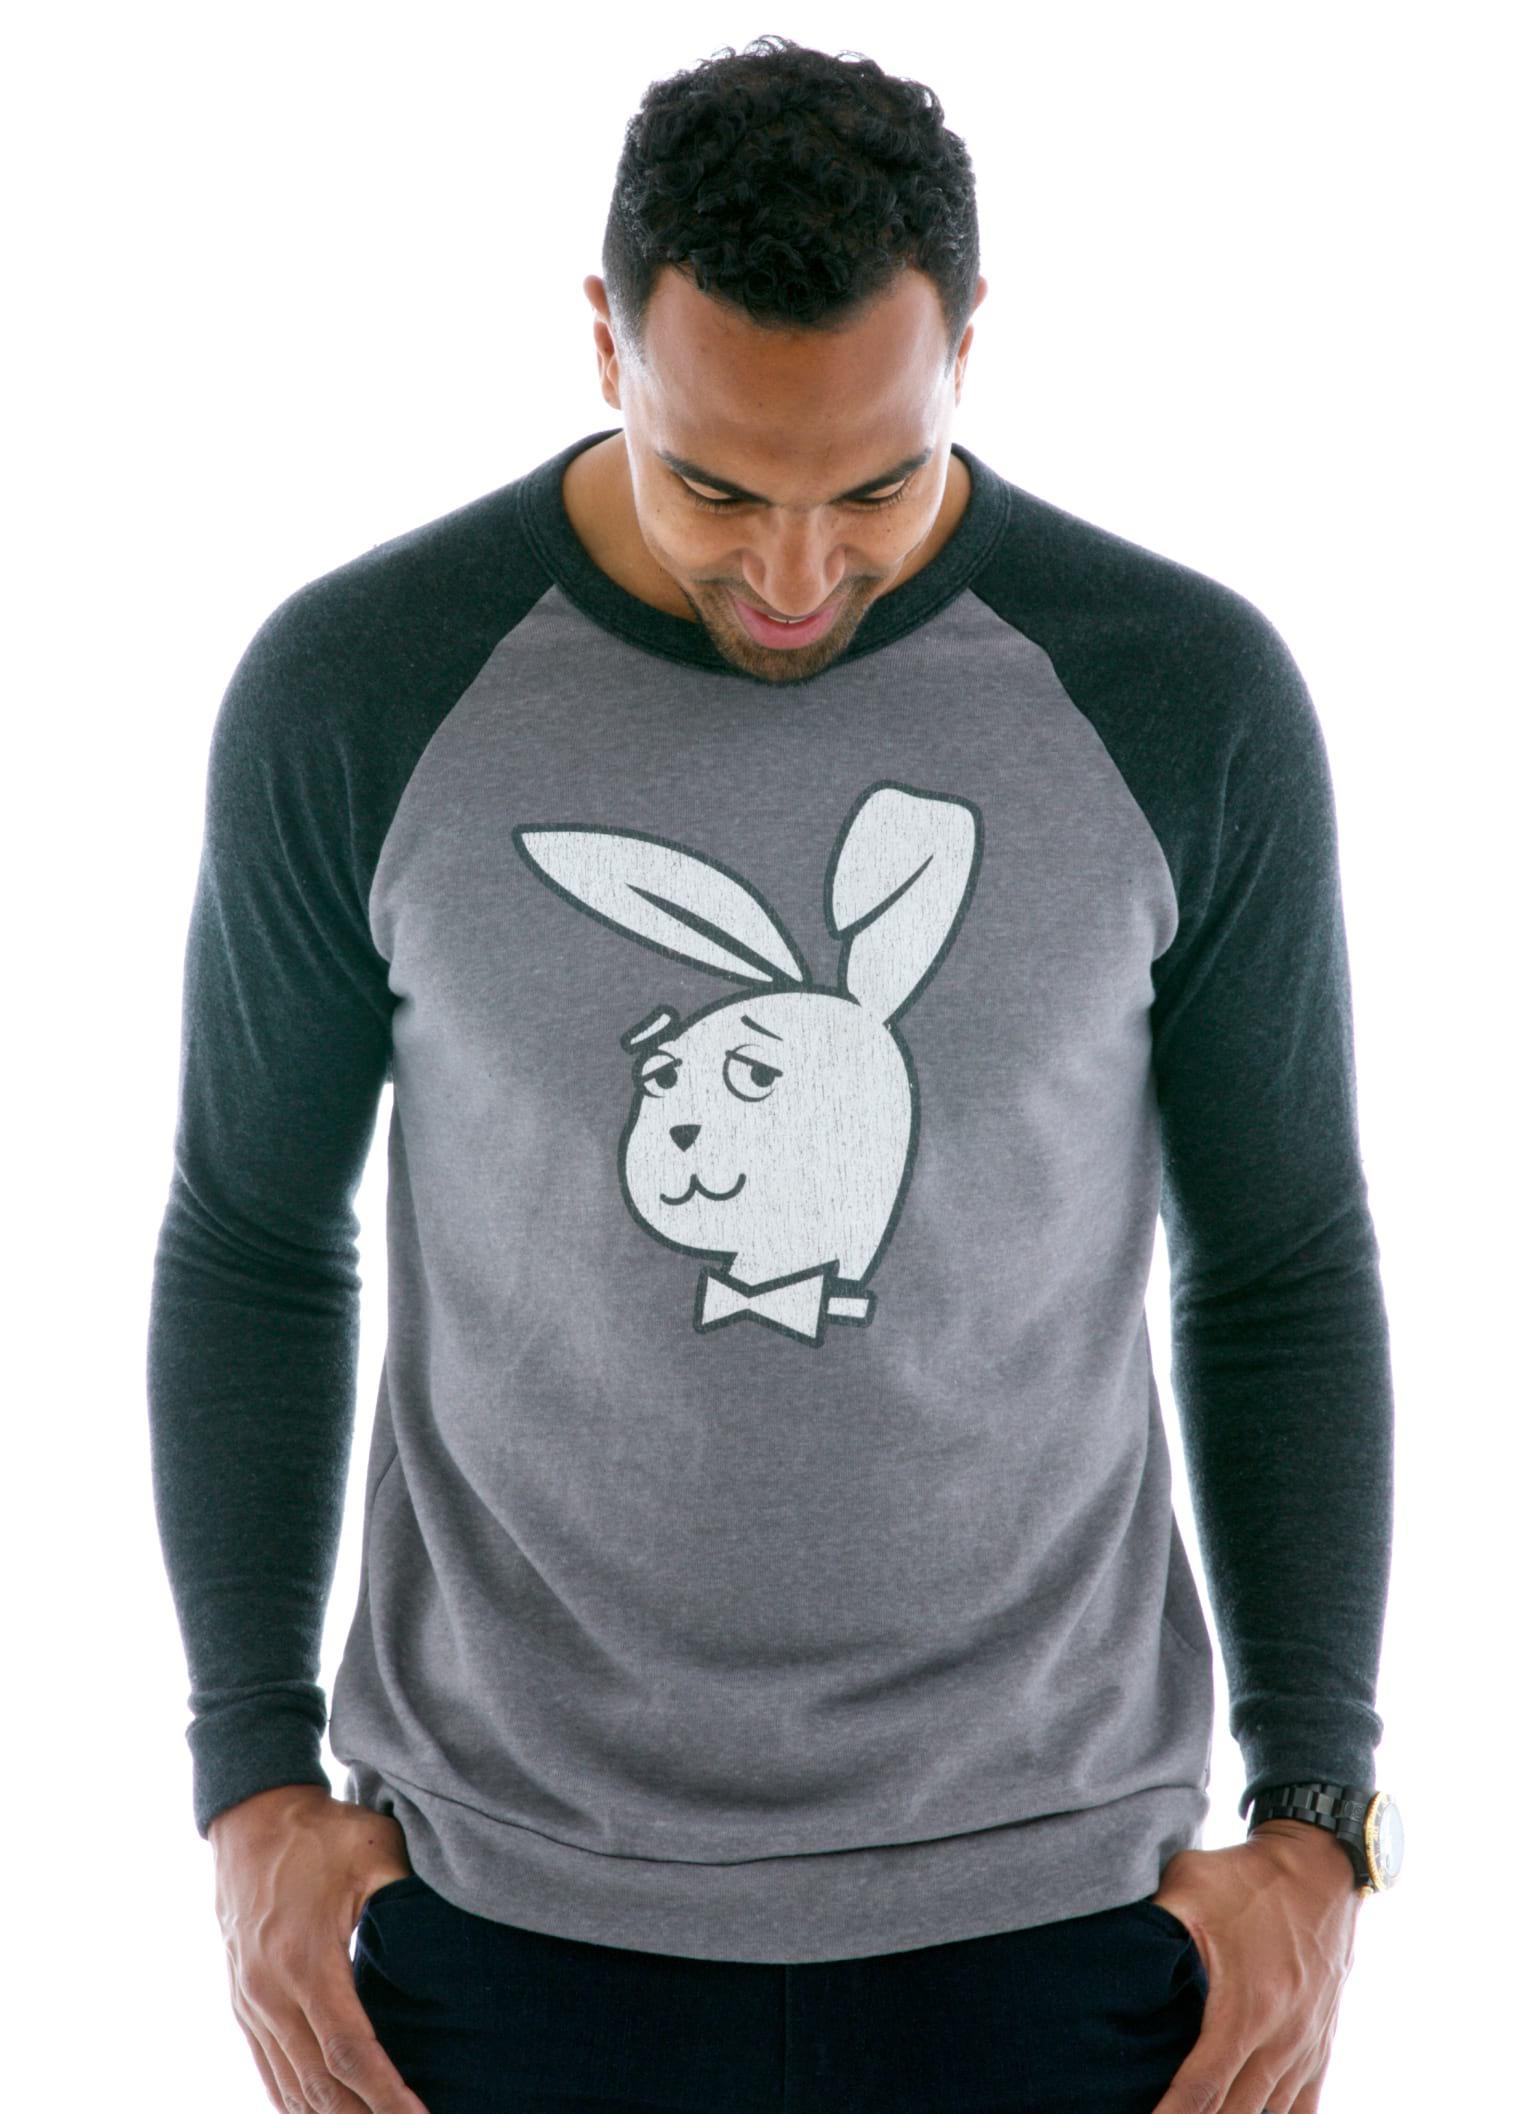 Men's Contrast Sleeve Old School Long Sleeve Raglan T-Shirt